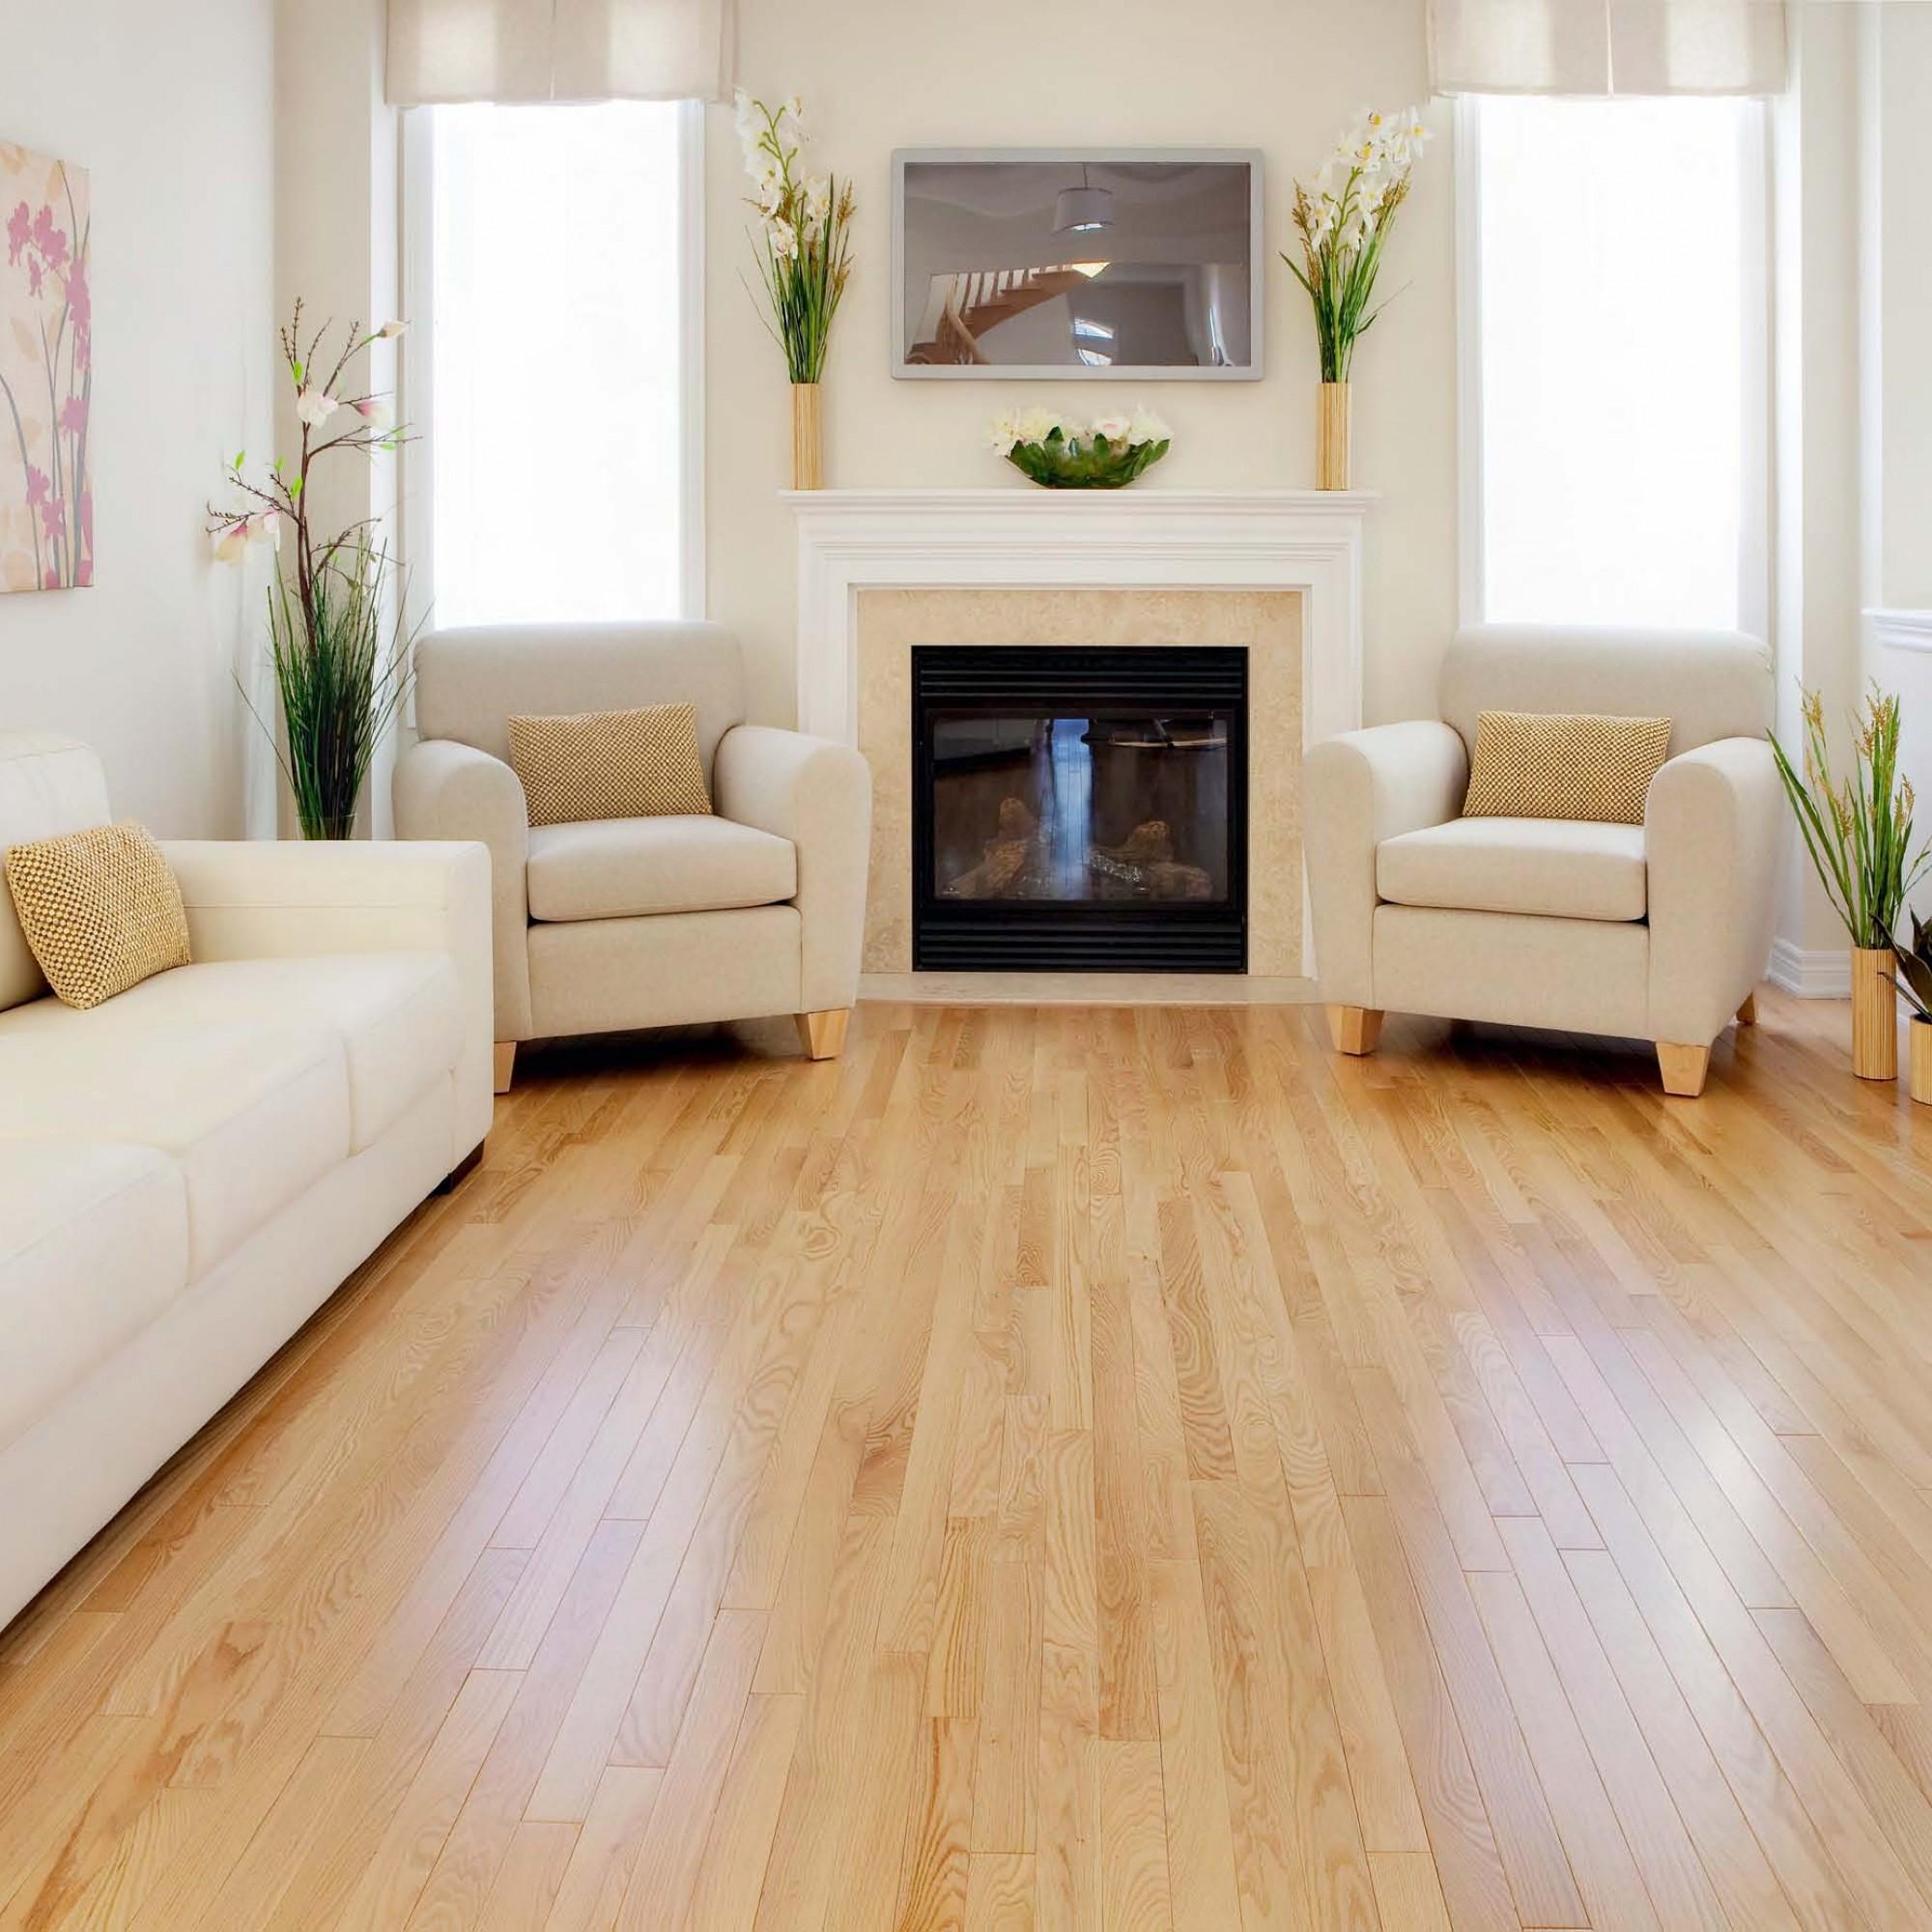 oak wood floor living room modern design ideas for smooth red natural vintage hardwood flooring and engineered back